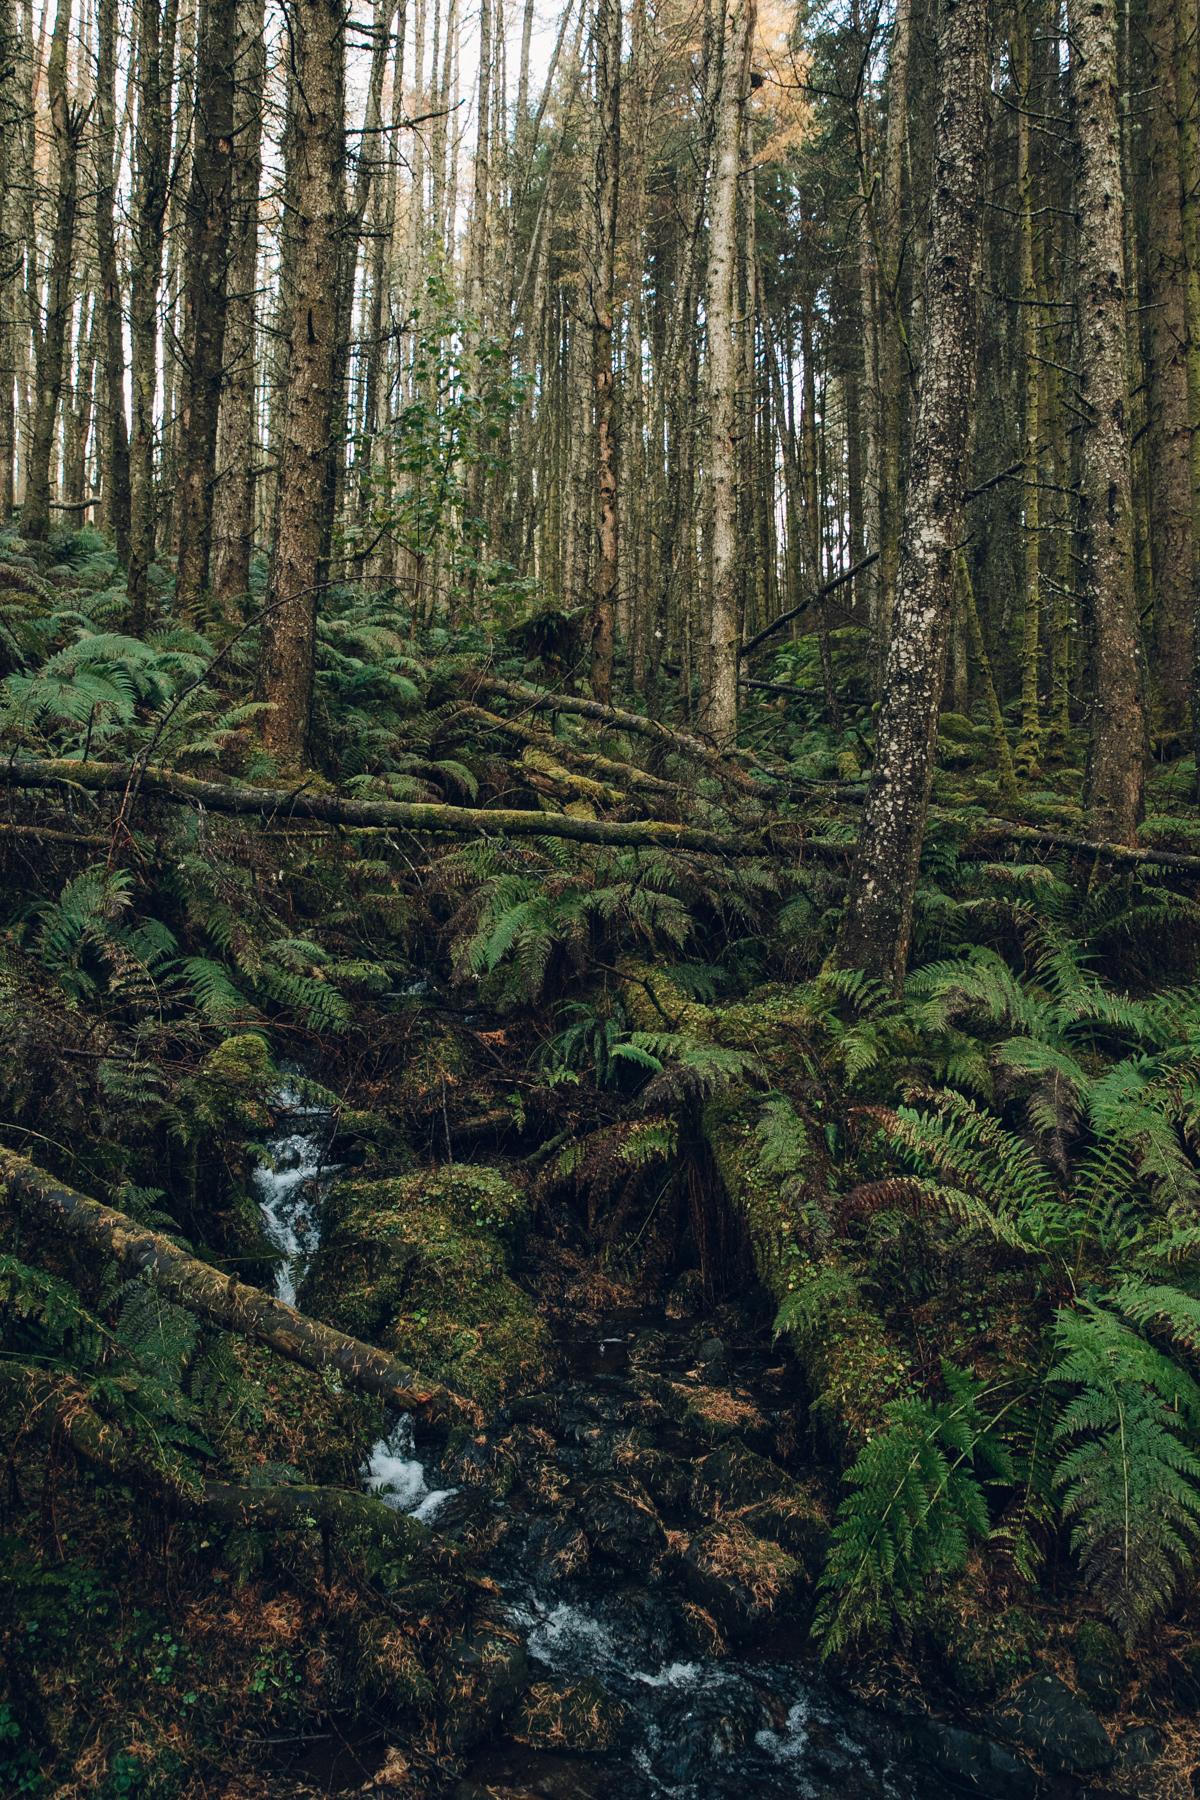 A trickling stream running through the woods.